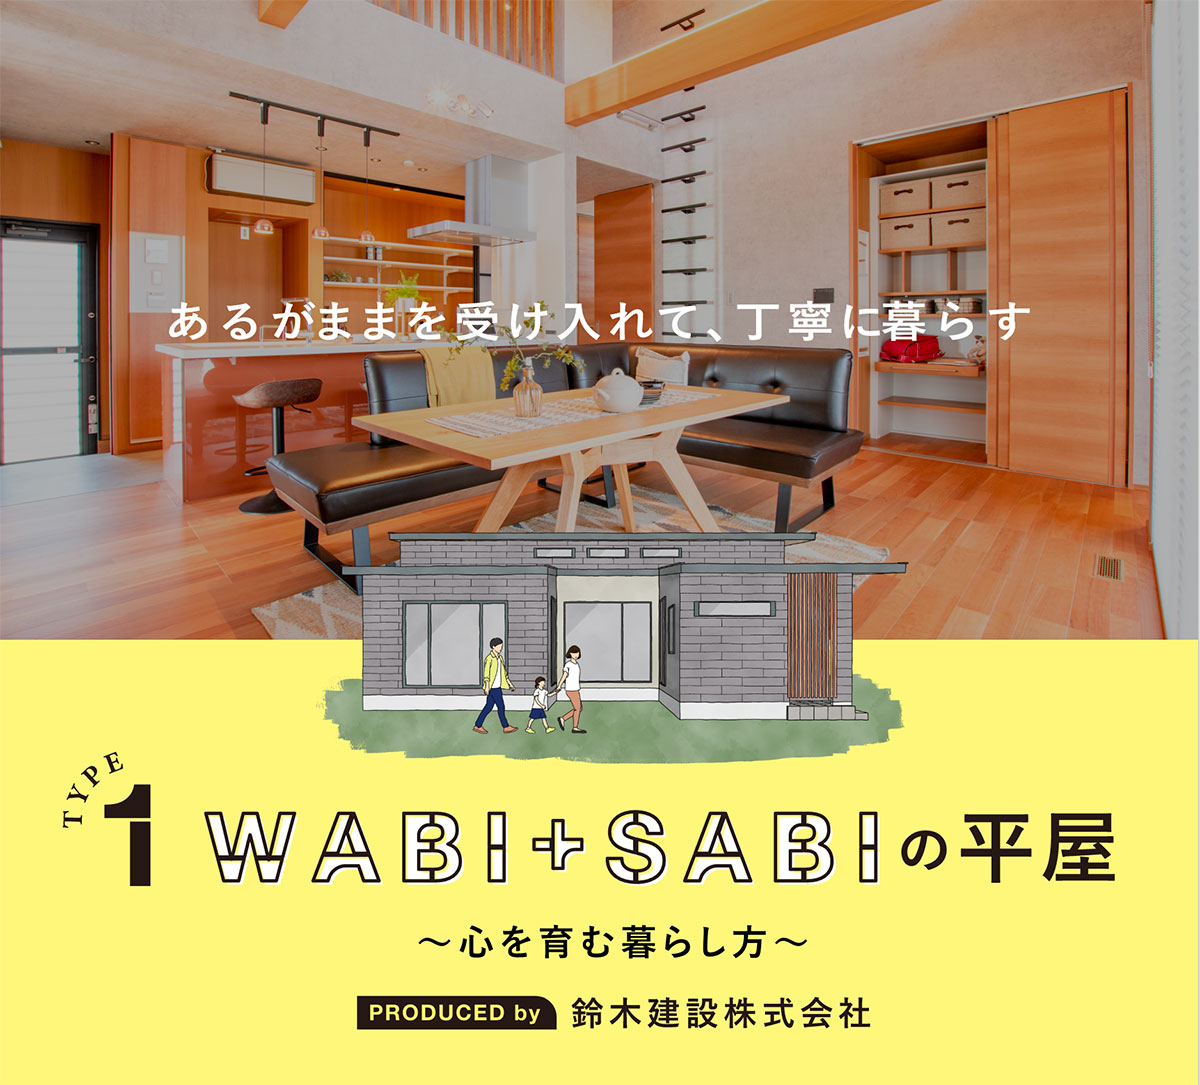 1.WABI+SABIの平屋~心を育む暮らし方~